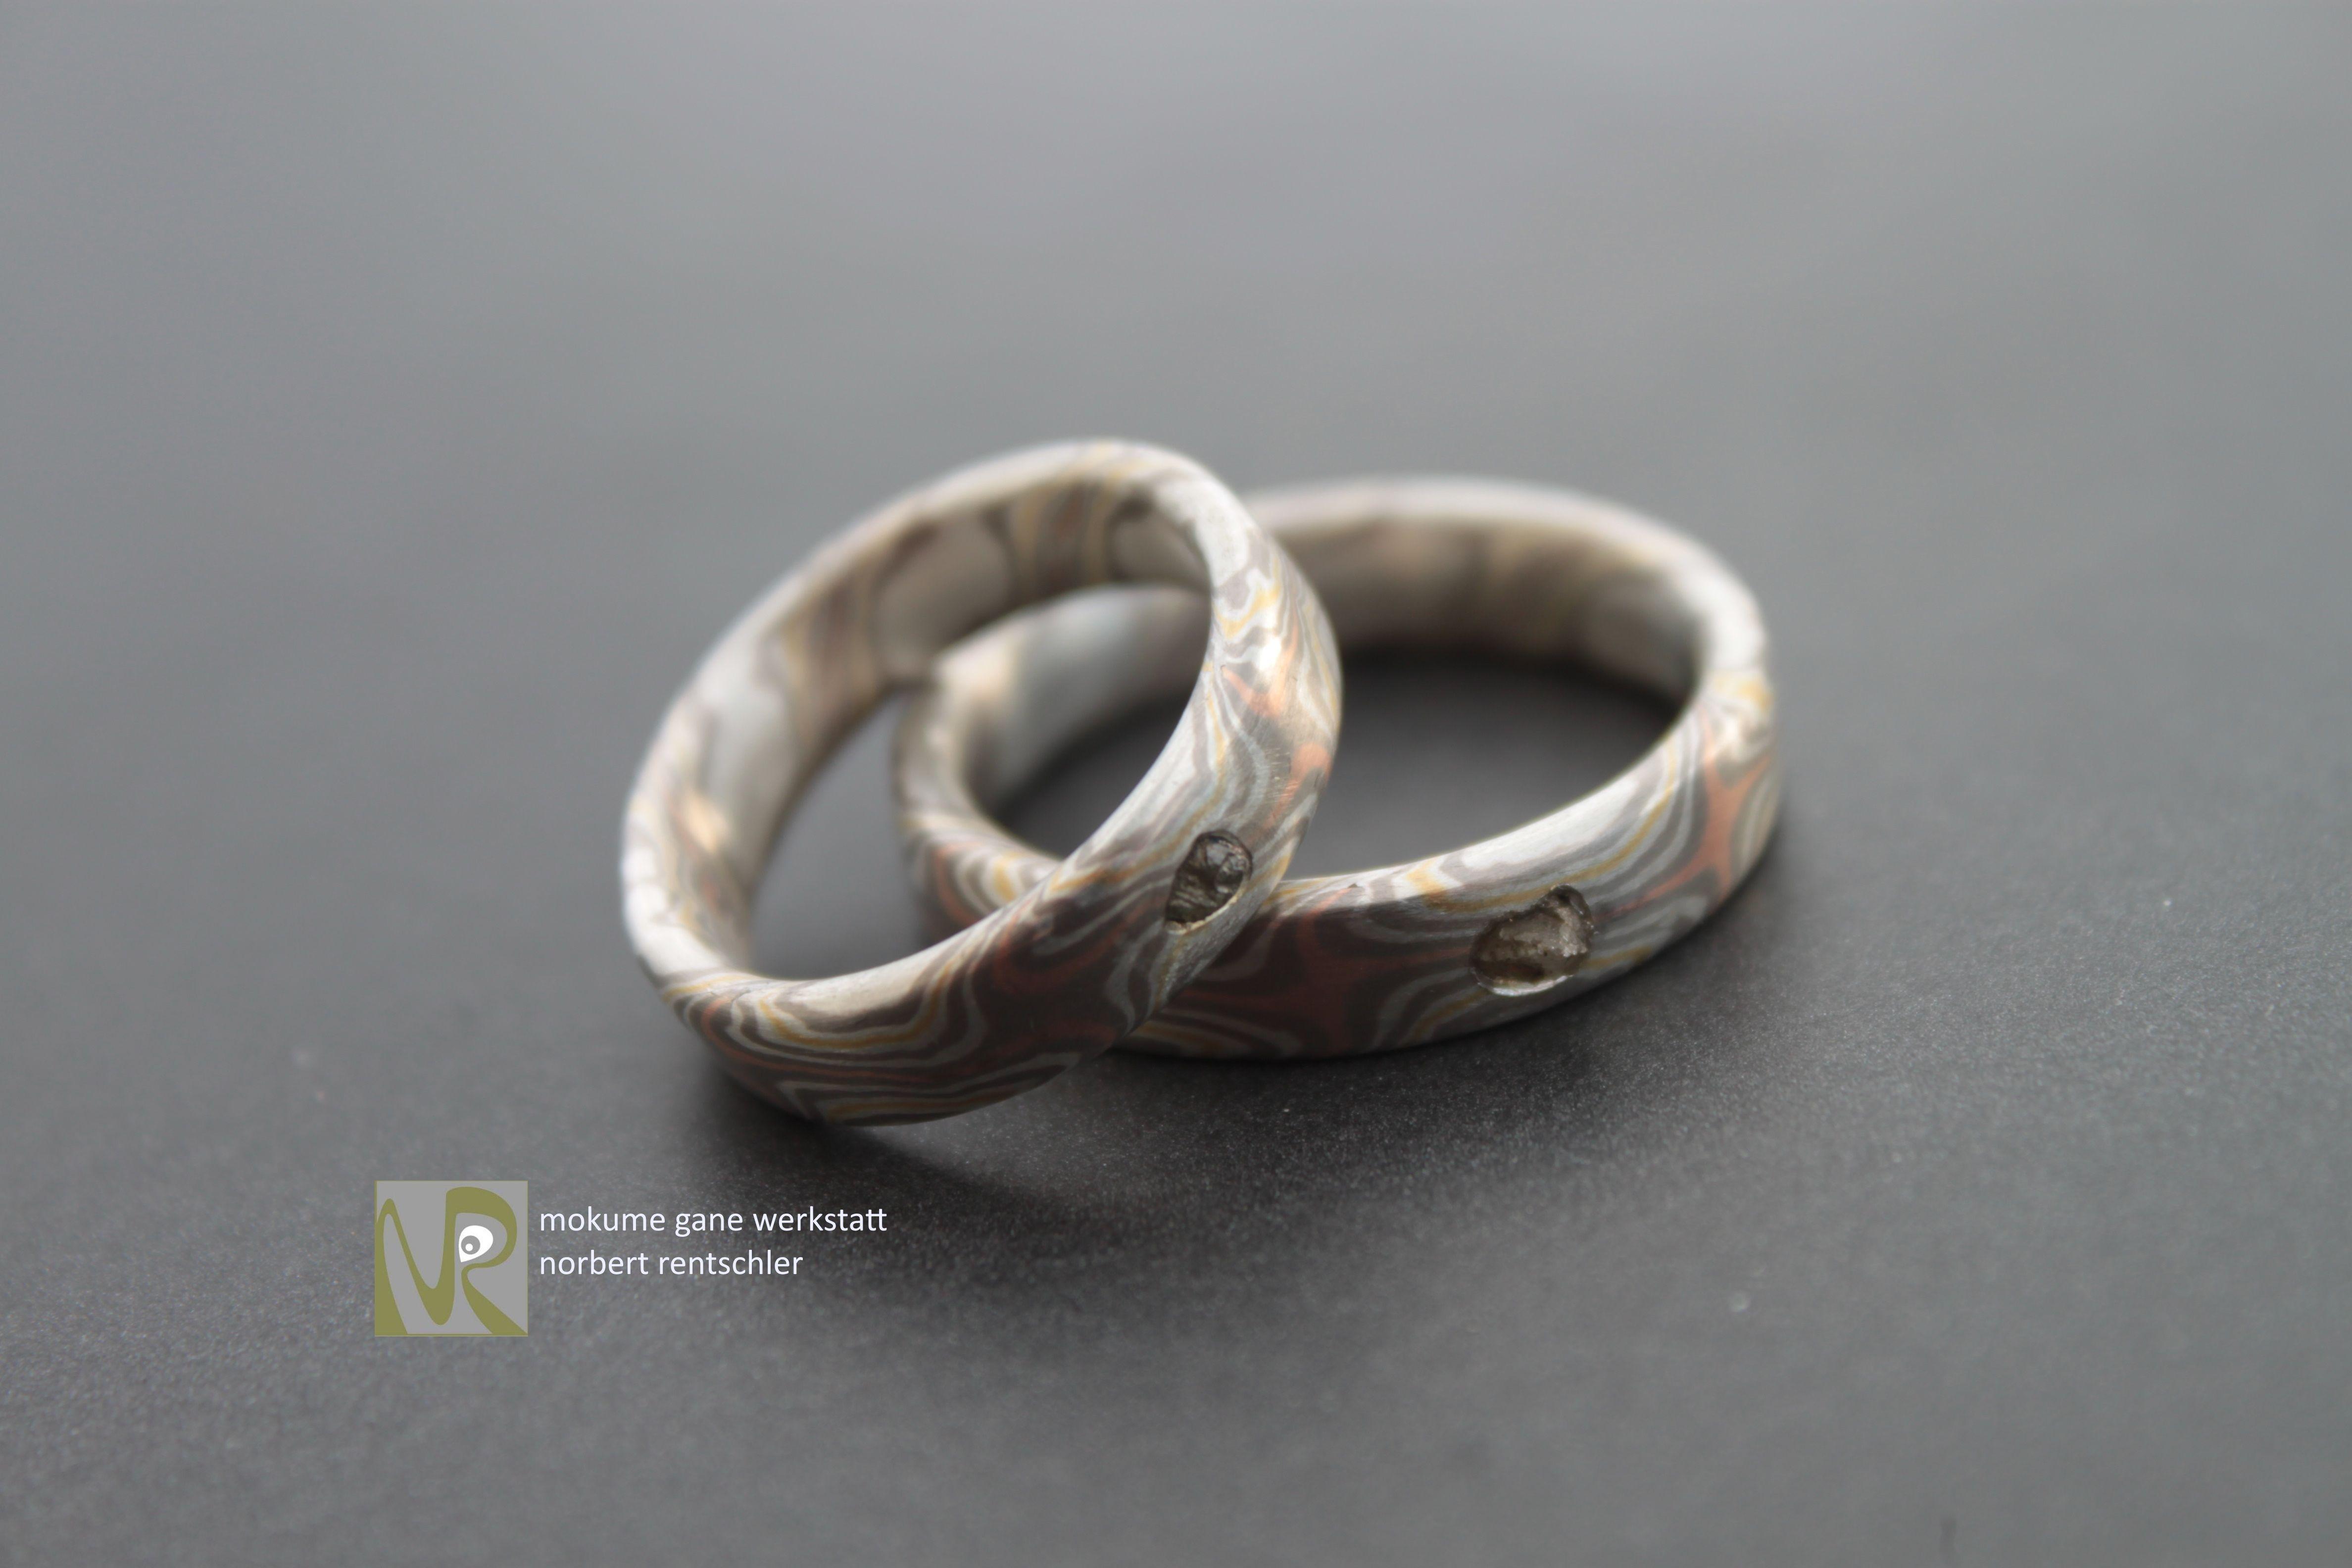 E62 Ausgefallene Trauringe Mokume Gane Rohdiamanten Trauringe Diamanten Ringe Silber